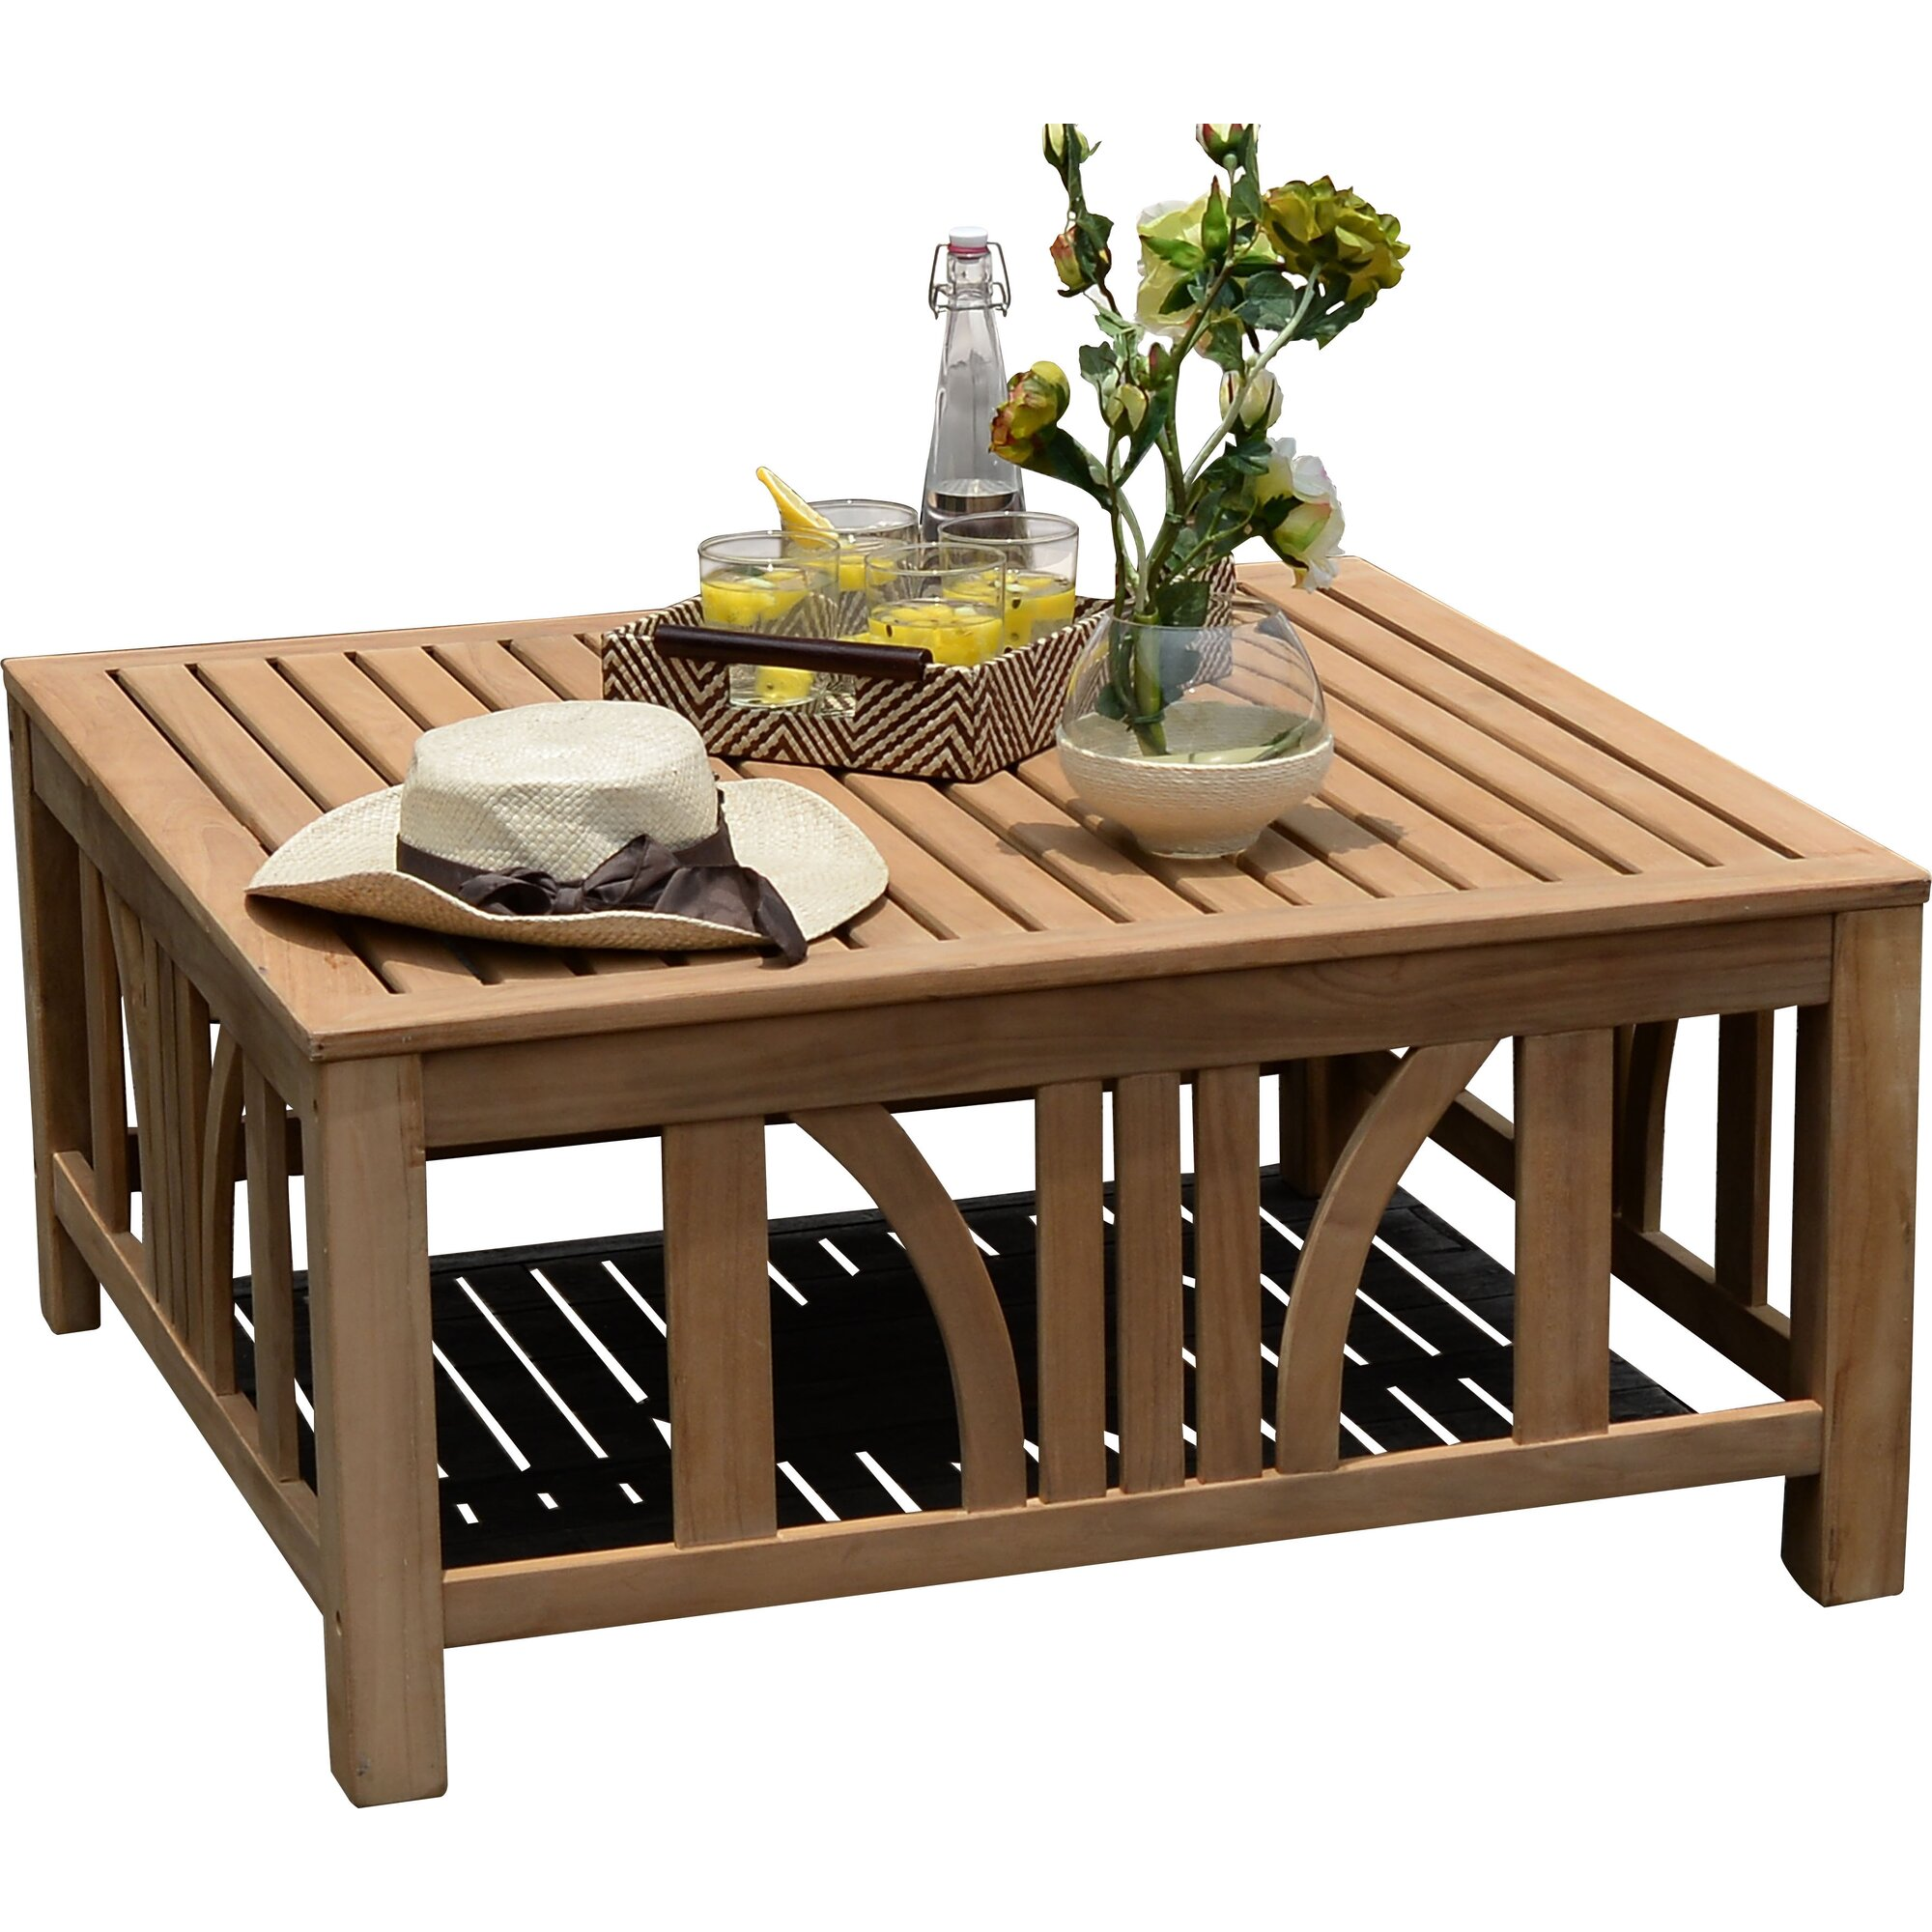 Cambridge casual kensington coffee table reviews wayfair for Wayfair outdoor coffee table